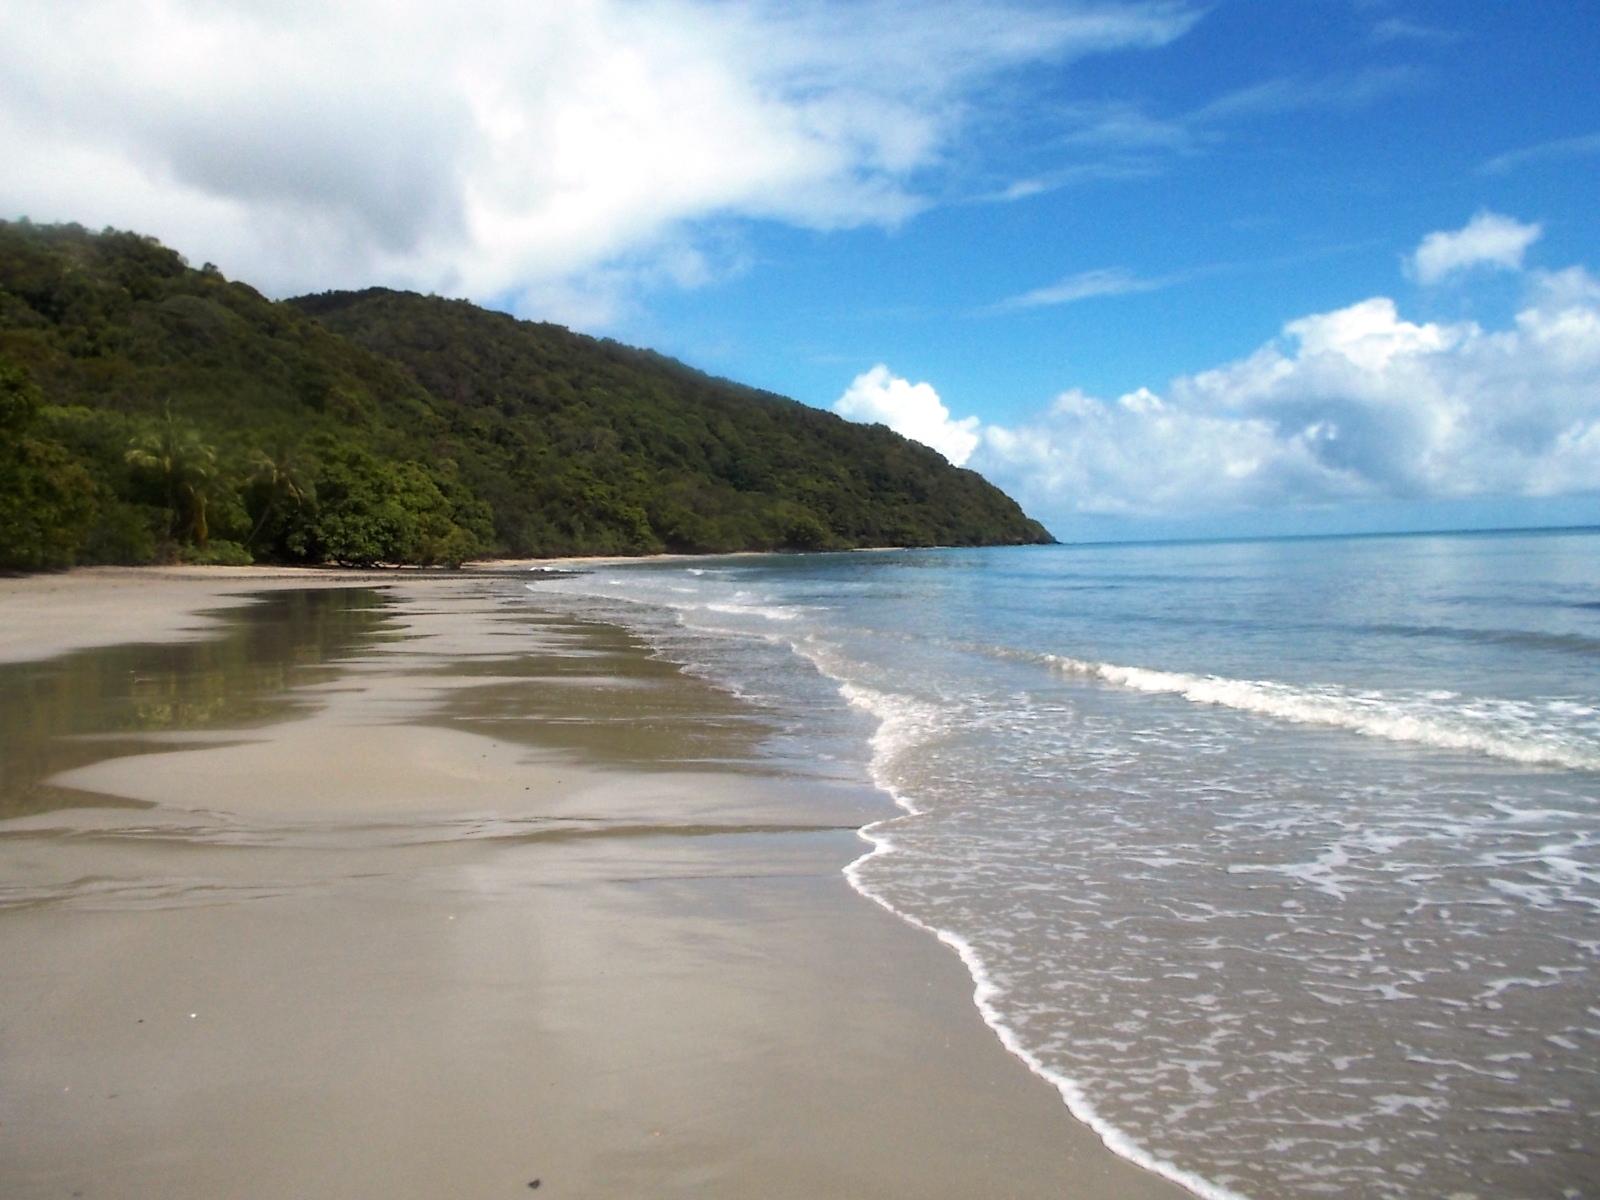 DSCN0491-Cape-Trib-beach-2013-12-25-crop-600pxw-224x142